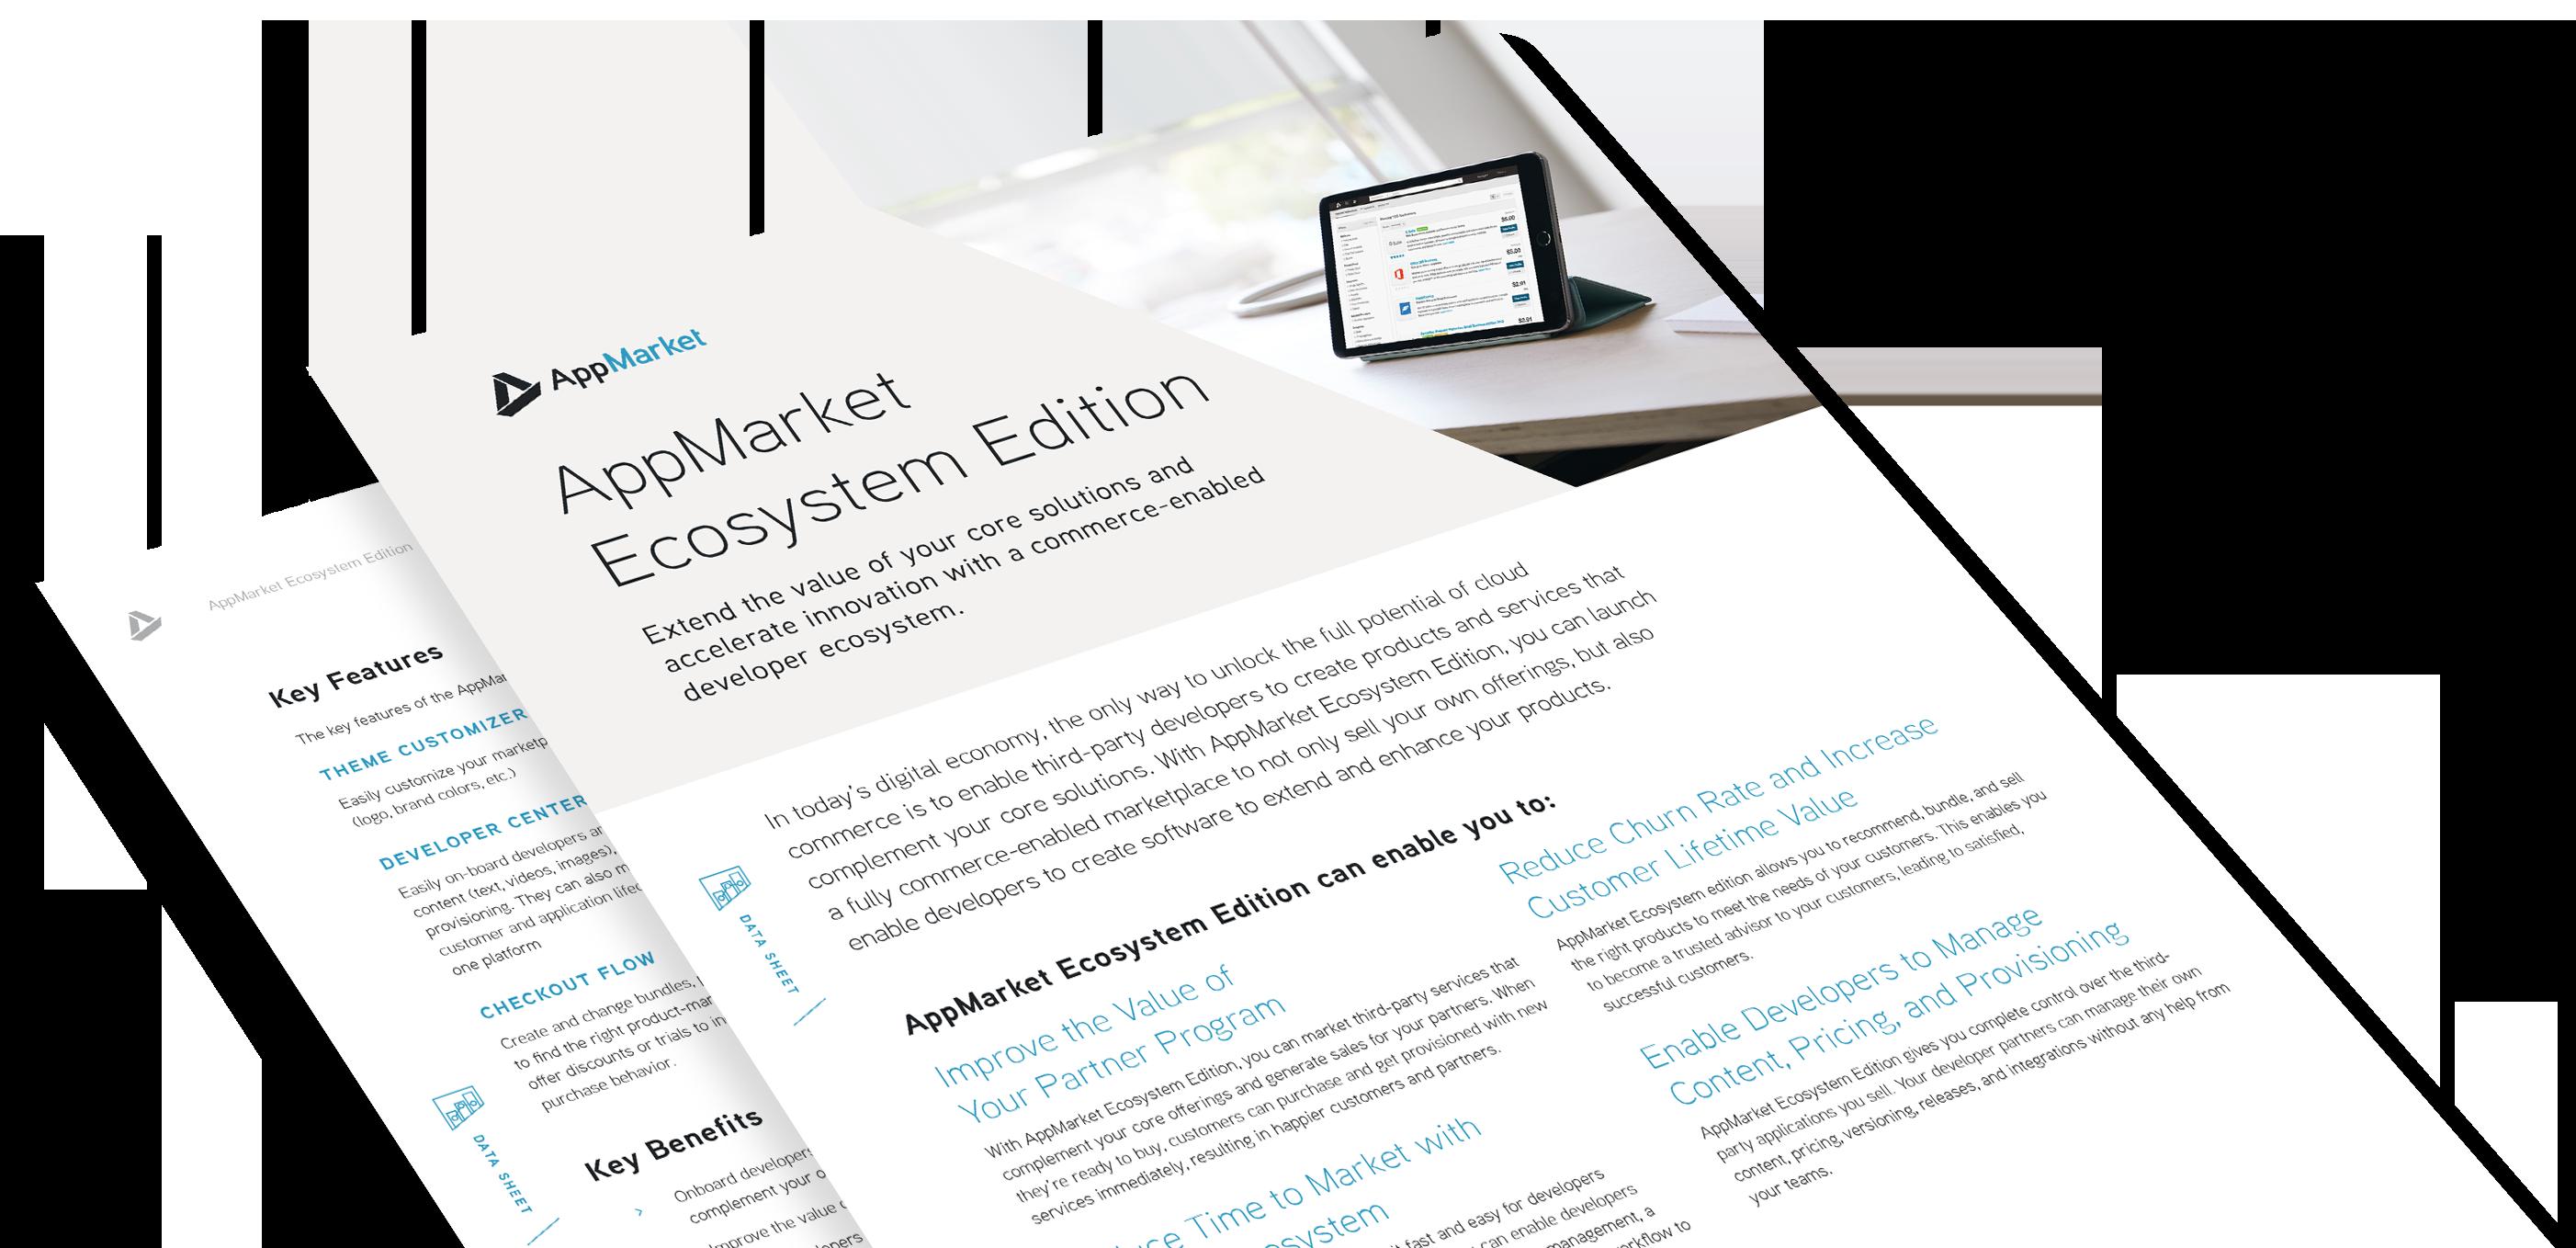 AppMarket Ecosystem Edition